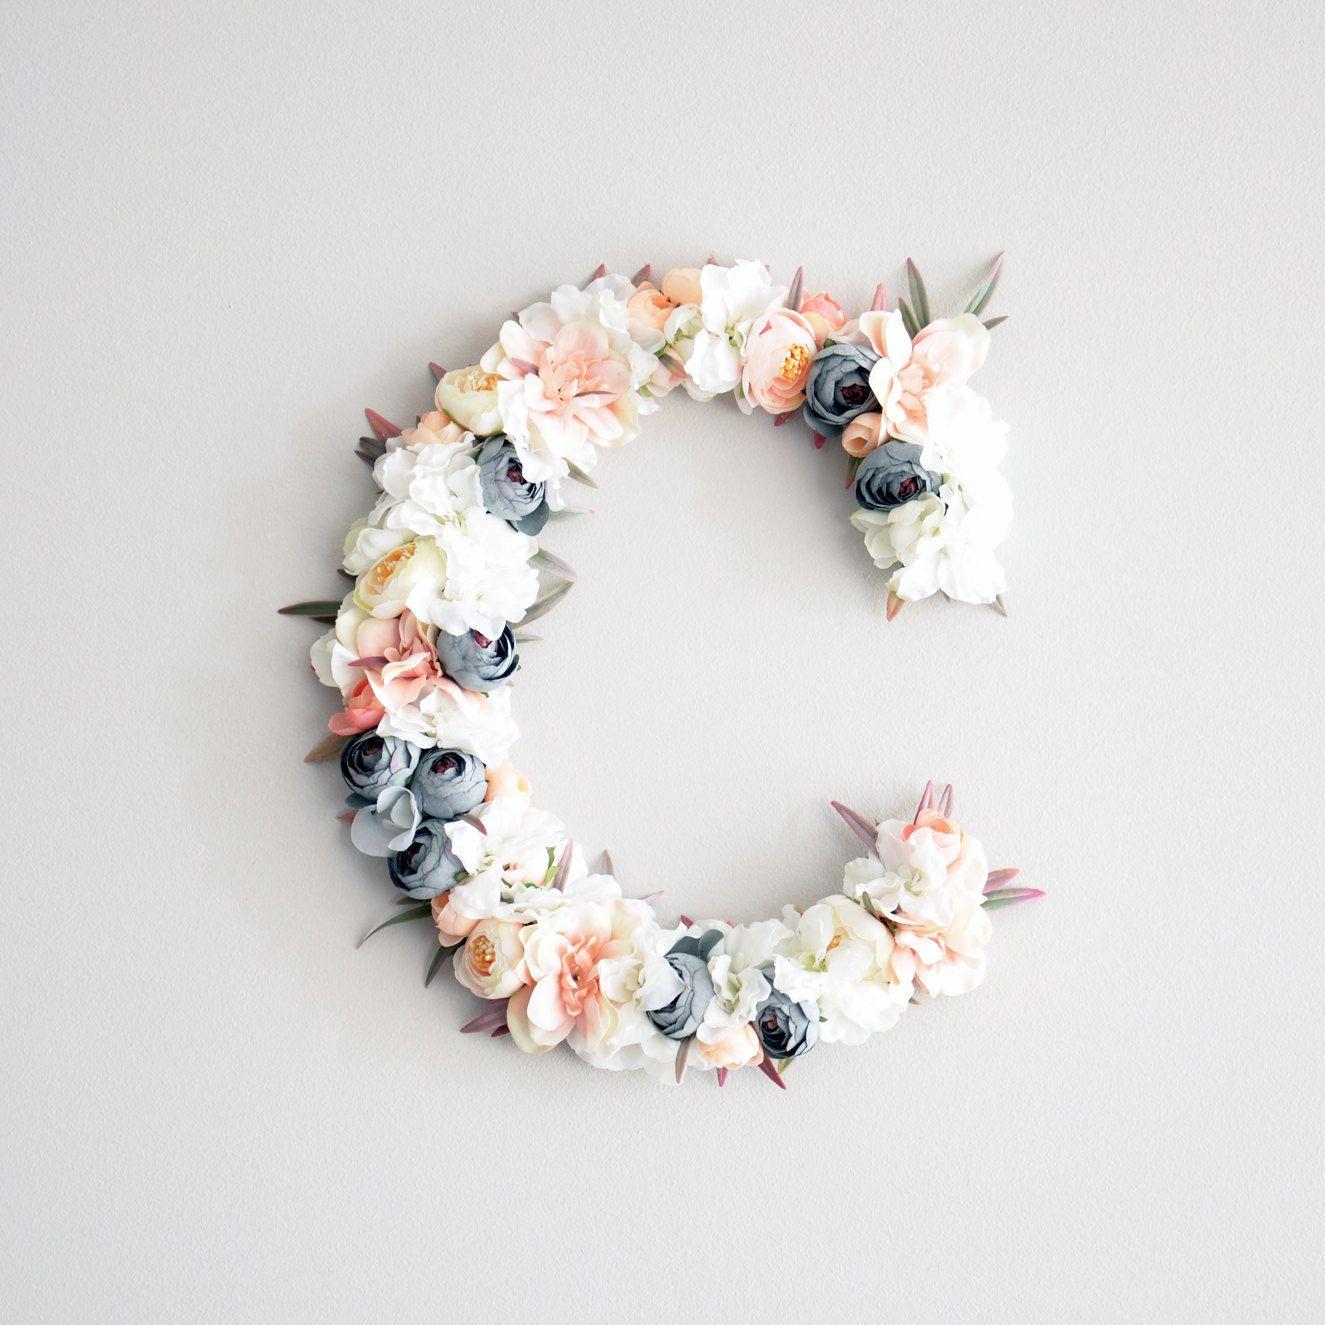 Diy Baby Nursery Floral Wall Decor: Floral Letter Baby Girl Nursery Decor, Wall Hanging Wall